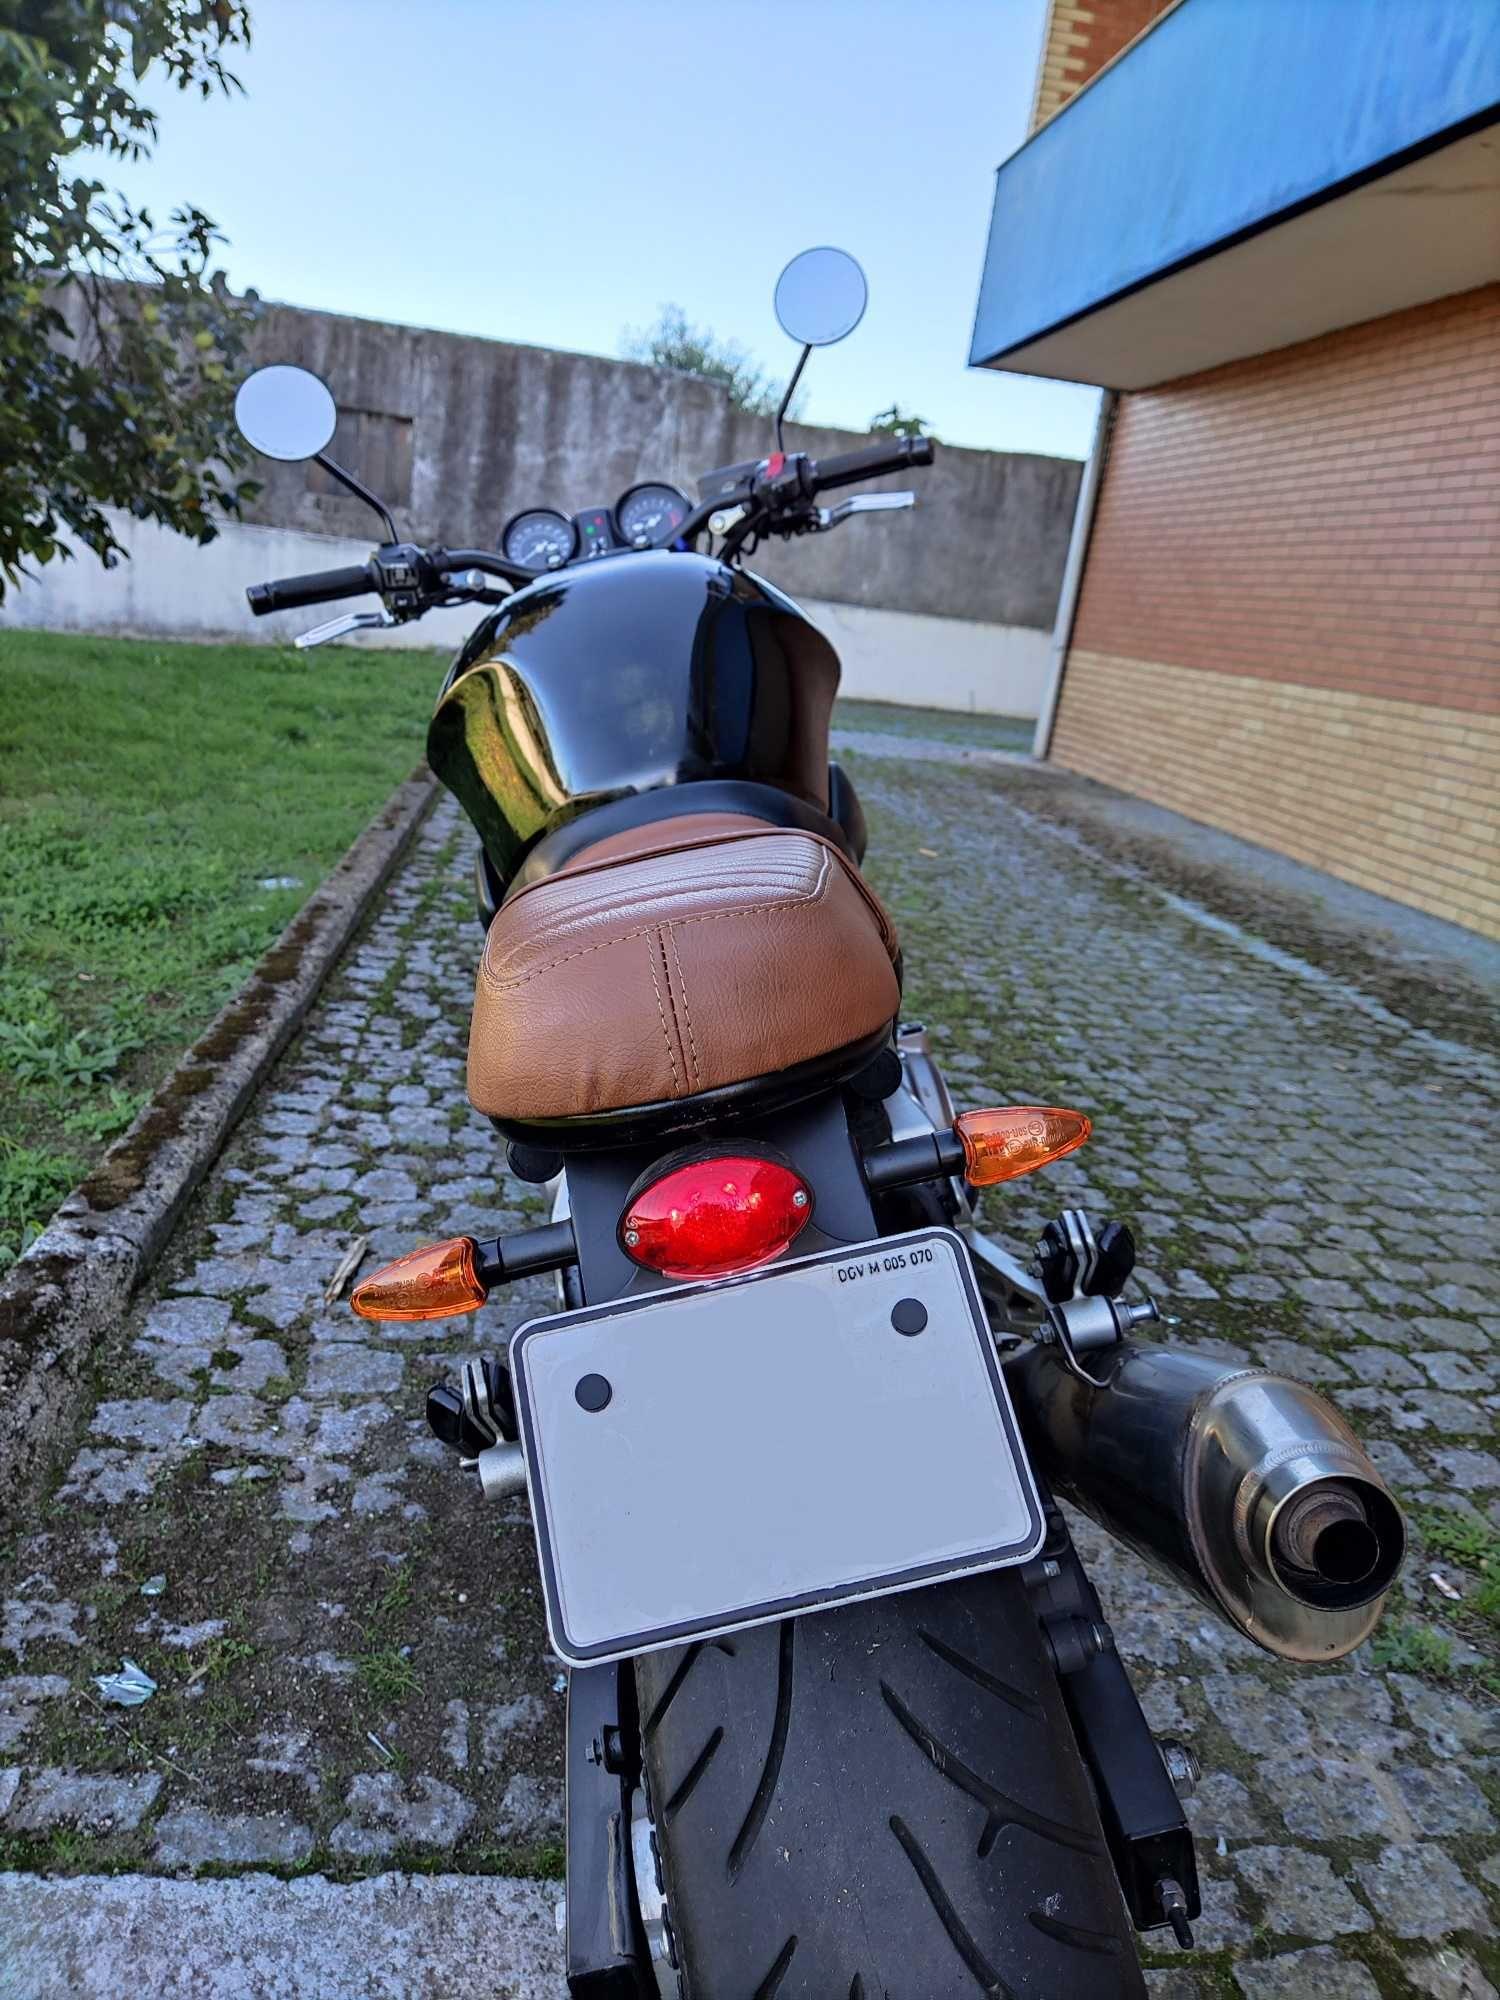 Honda CBF 500 Scrambler